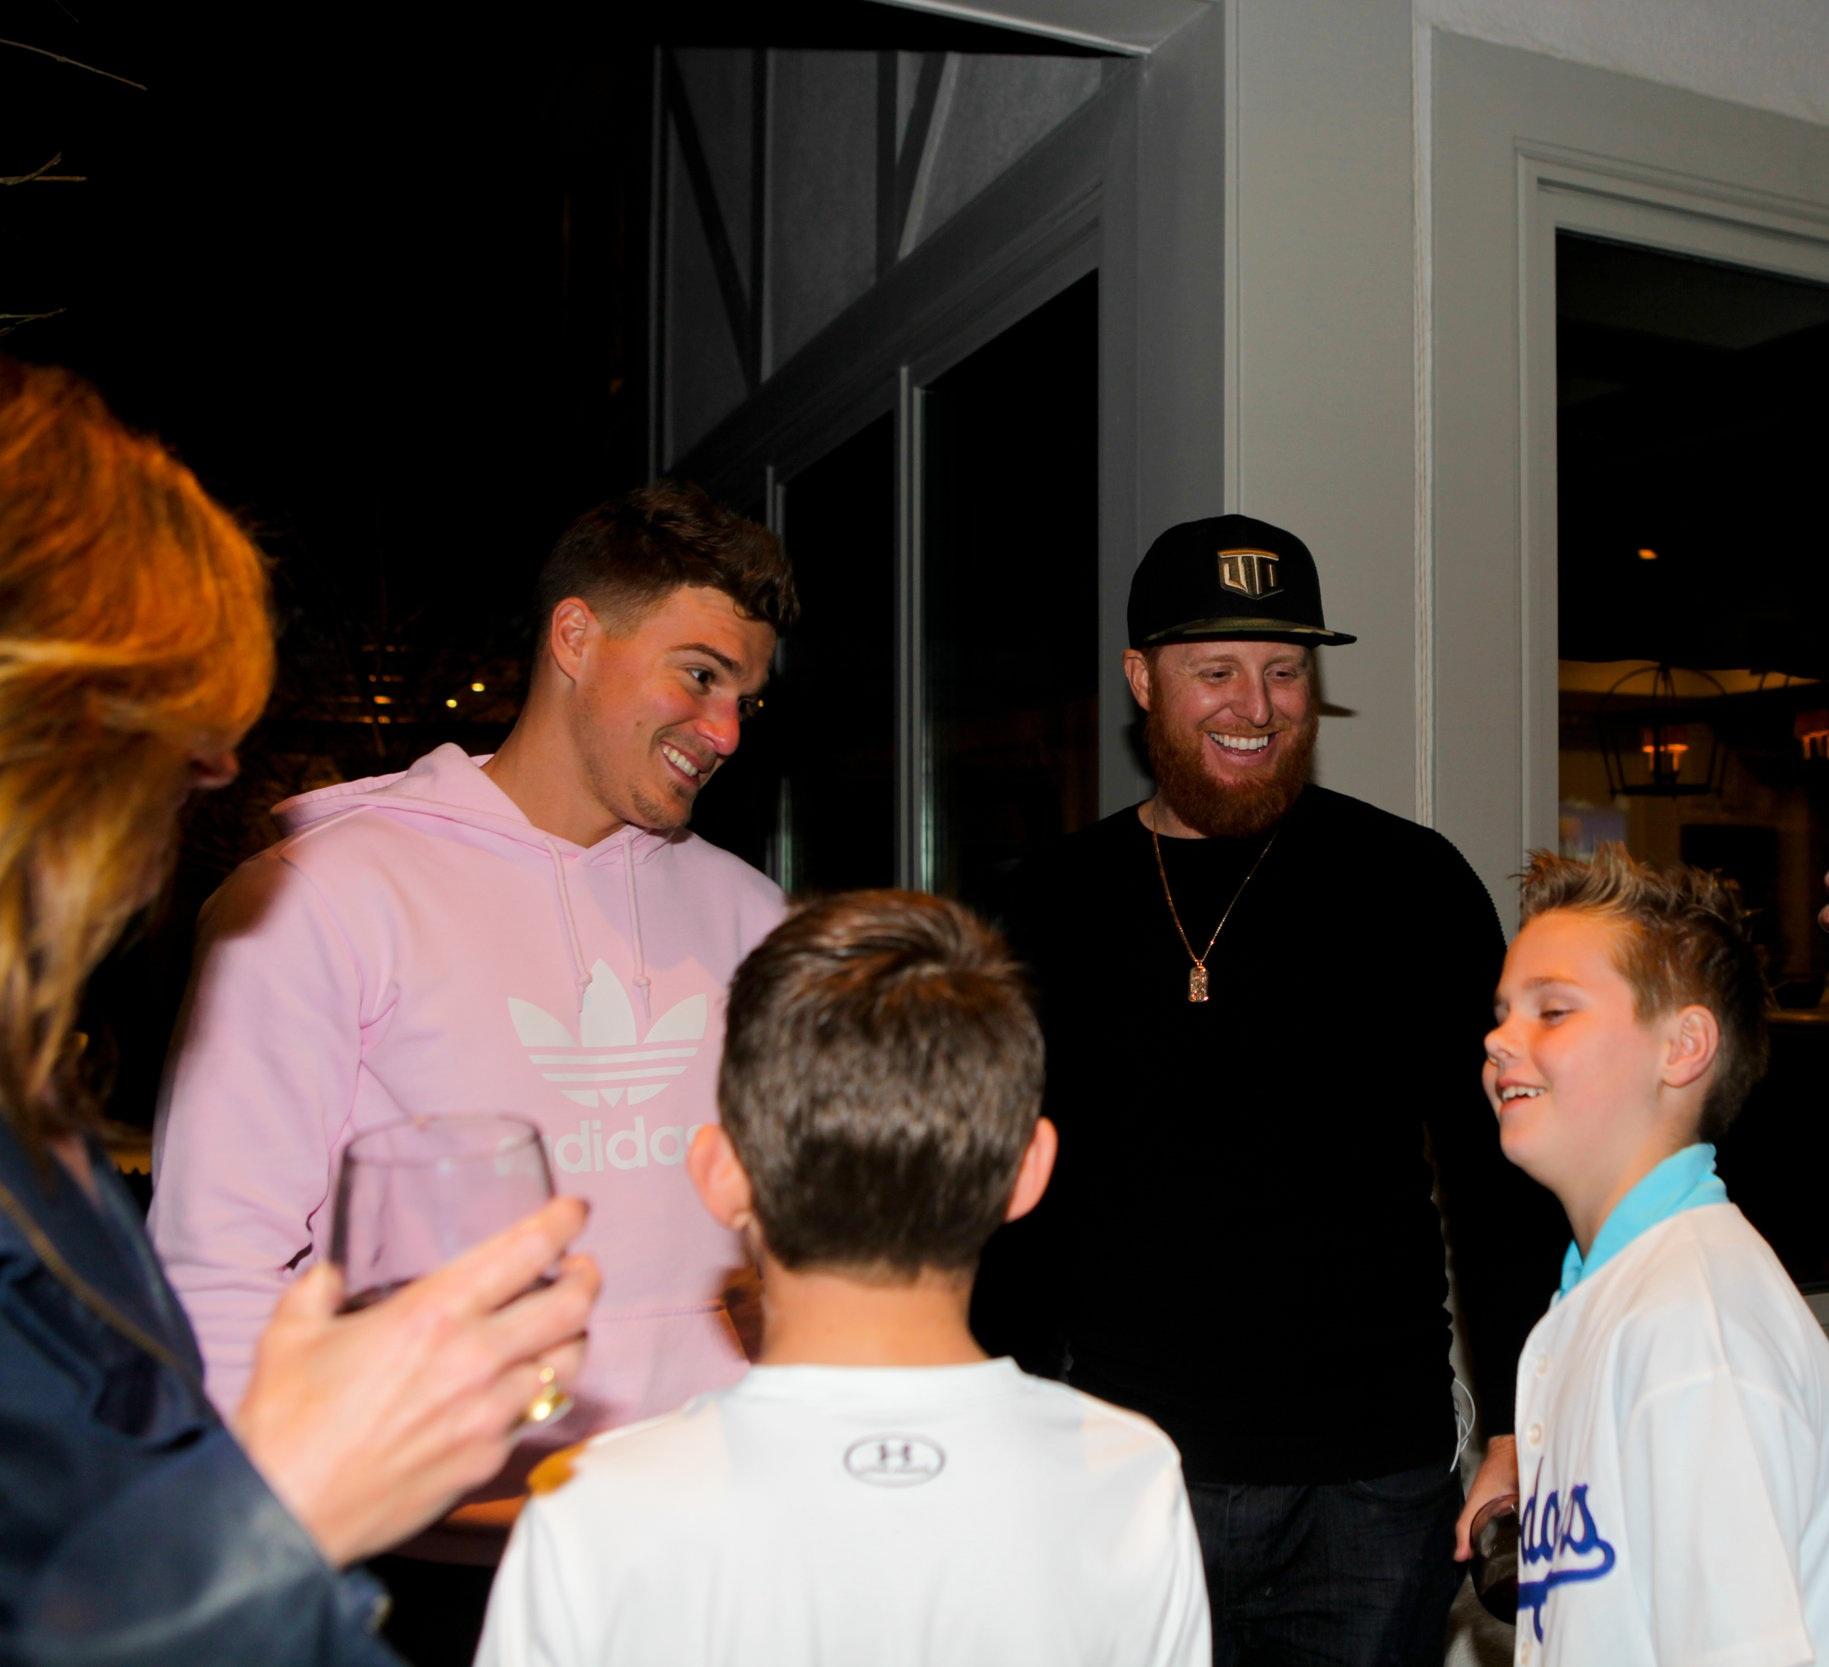 Kike Hernandez, Justin Turner & two kids who look up to them like heroes.